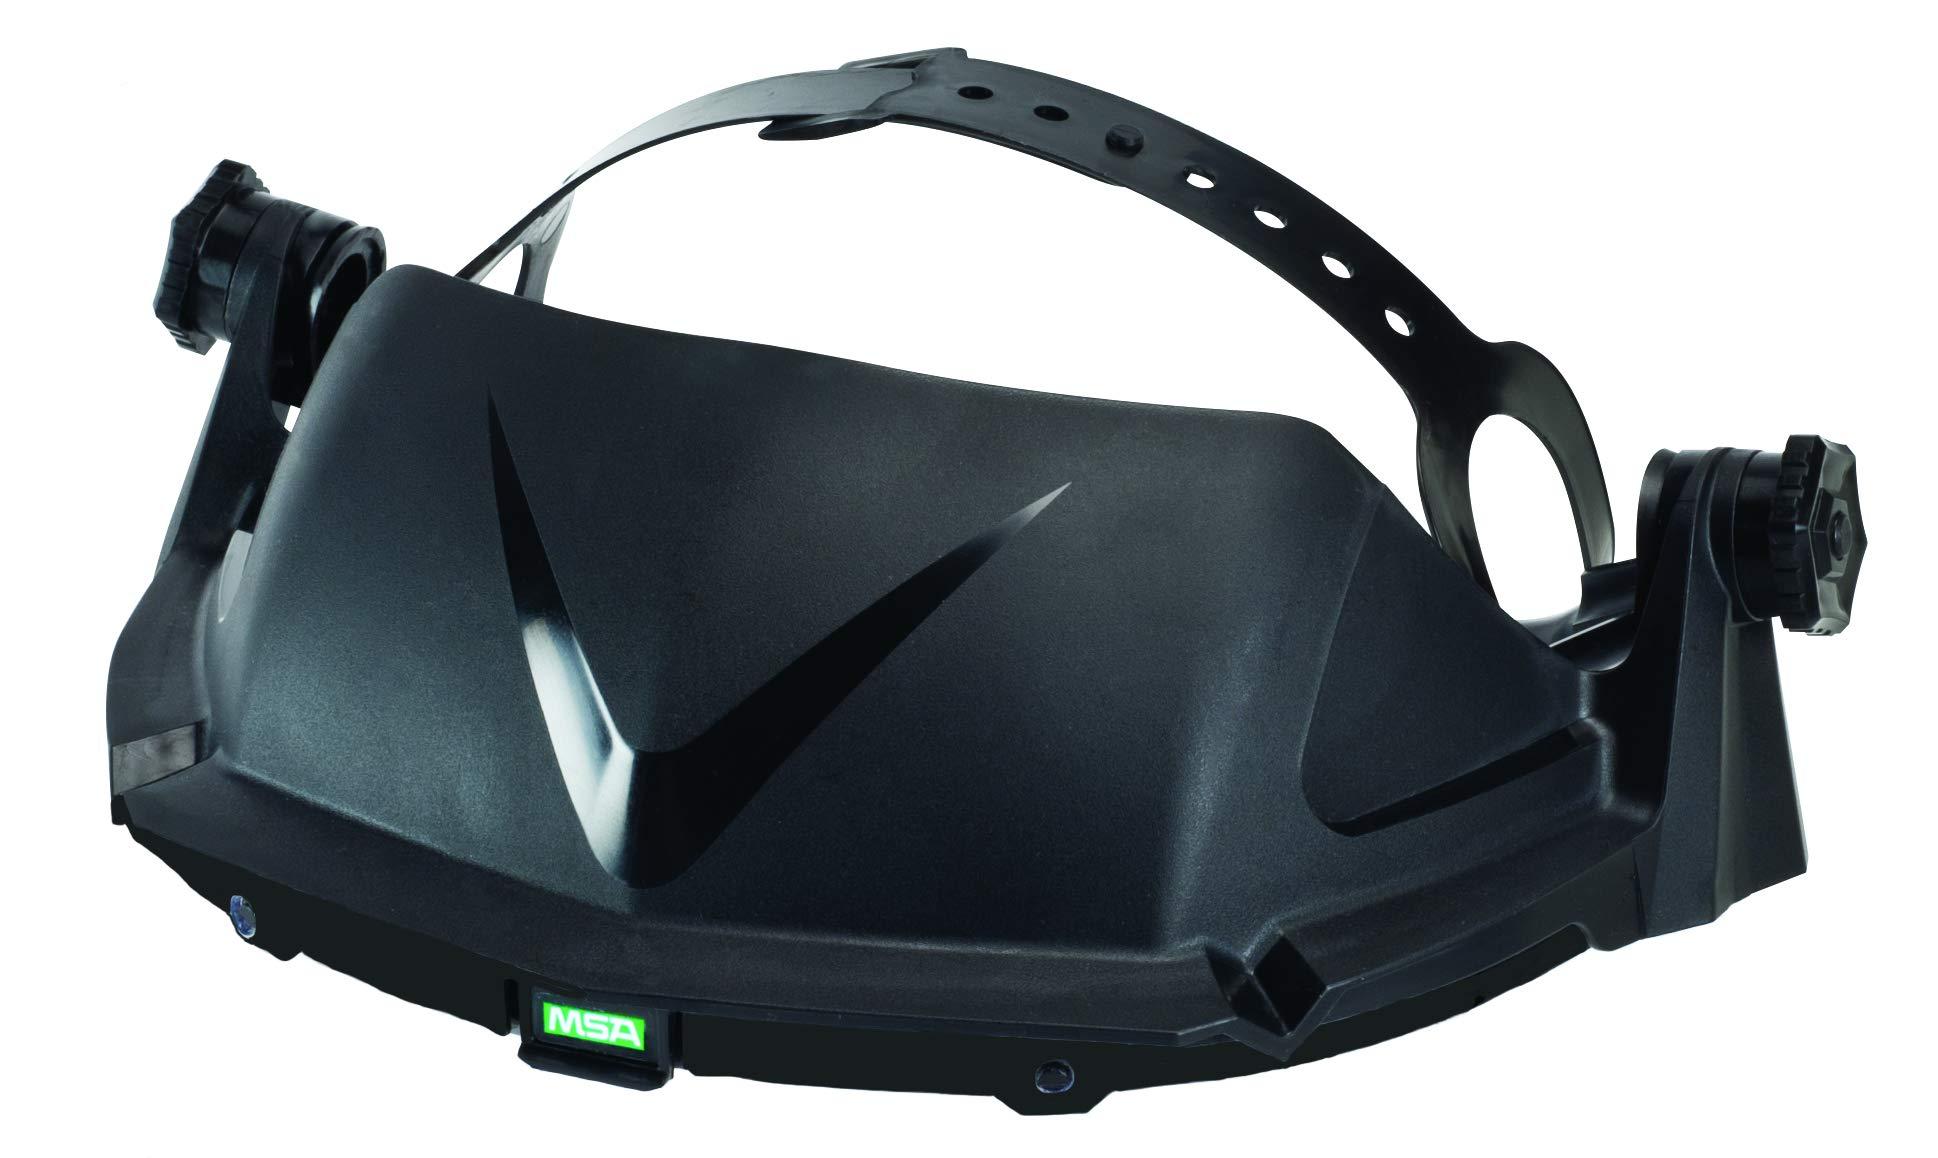 MSA 10127061 V-Gard Headgear, High Density Polyethylene, Standard, Black (Pack of 10) by MSA